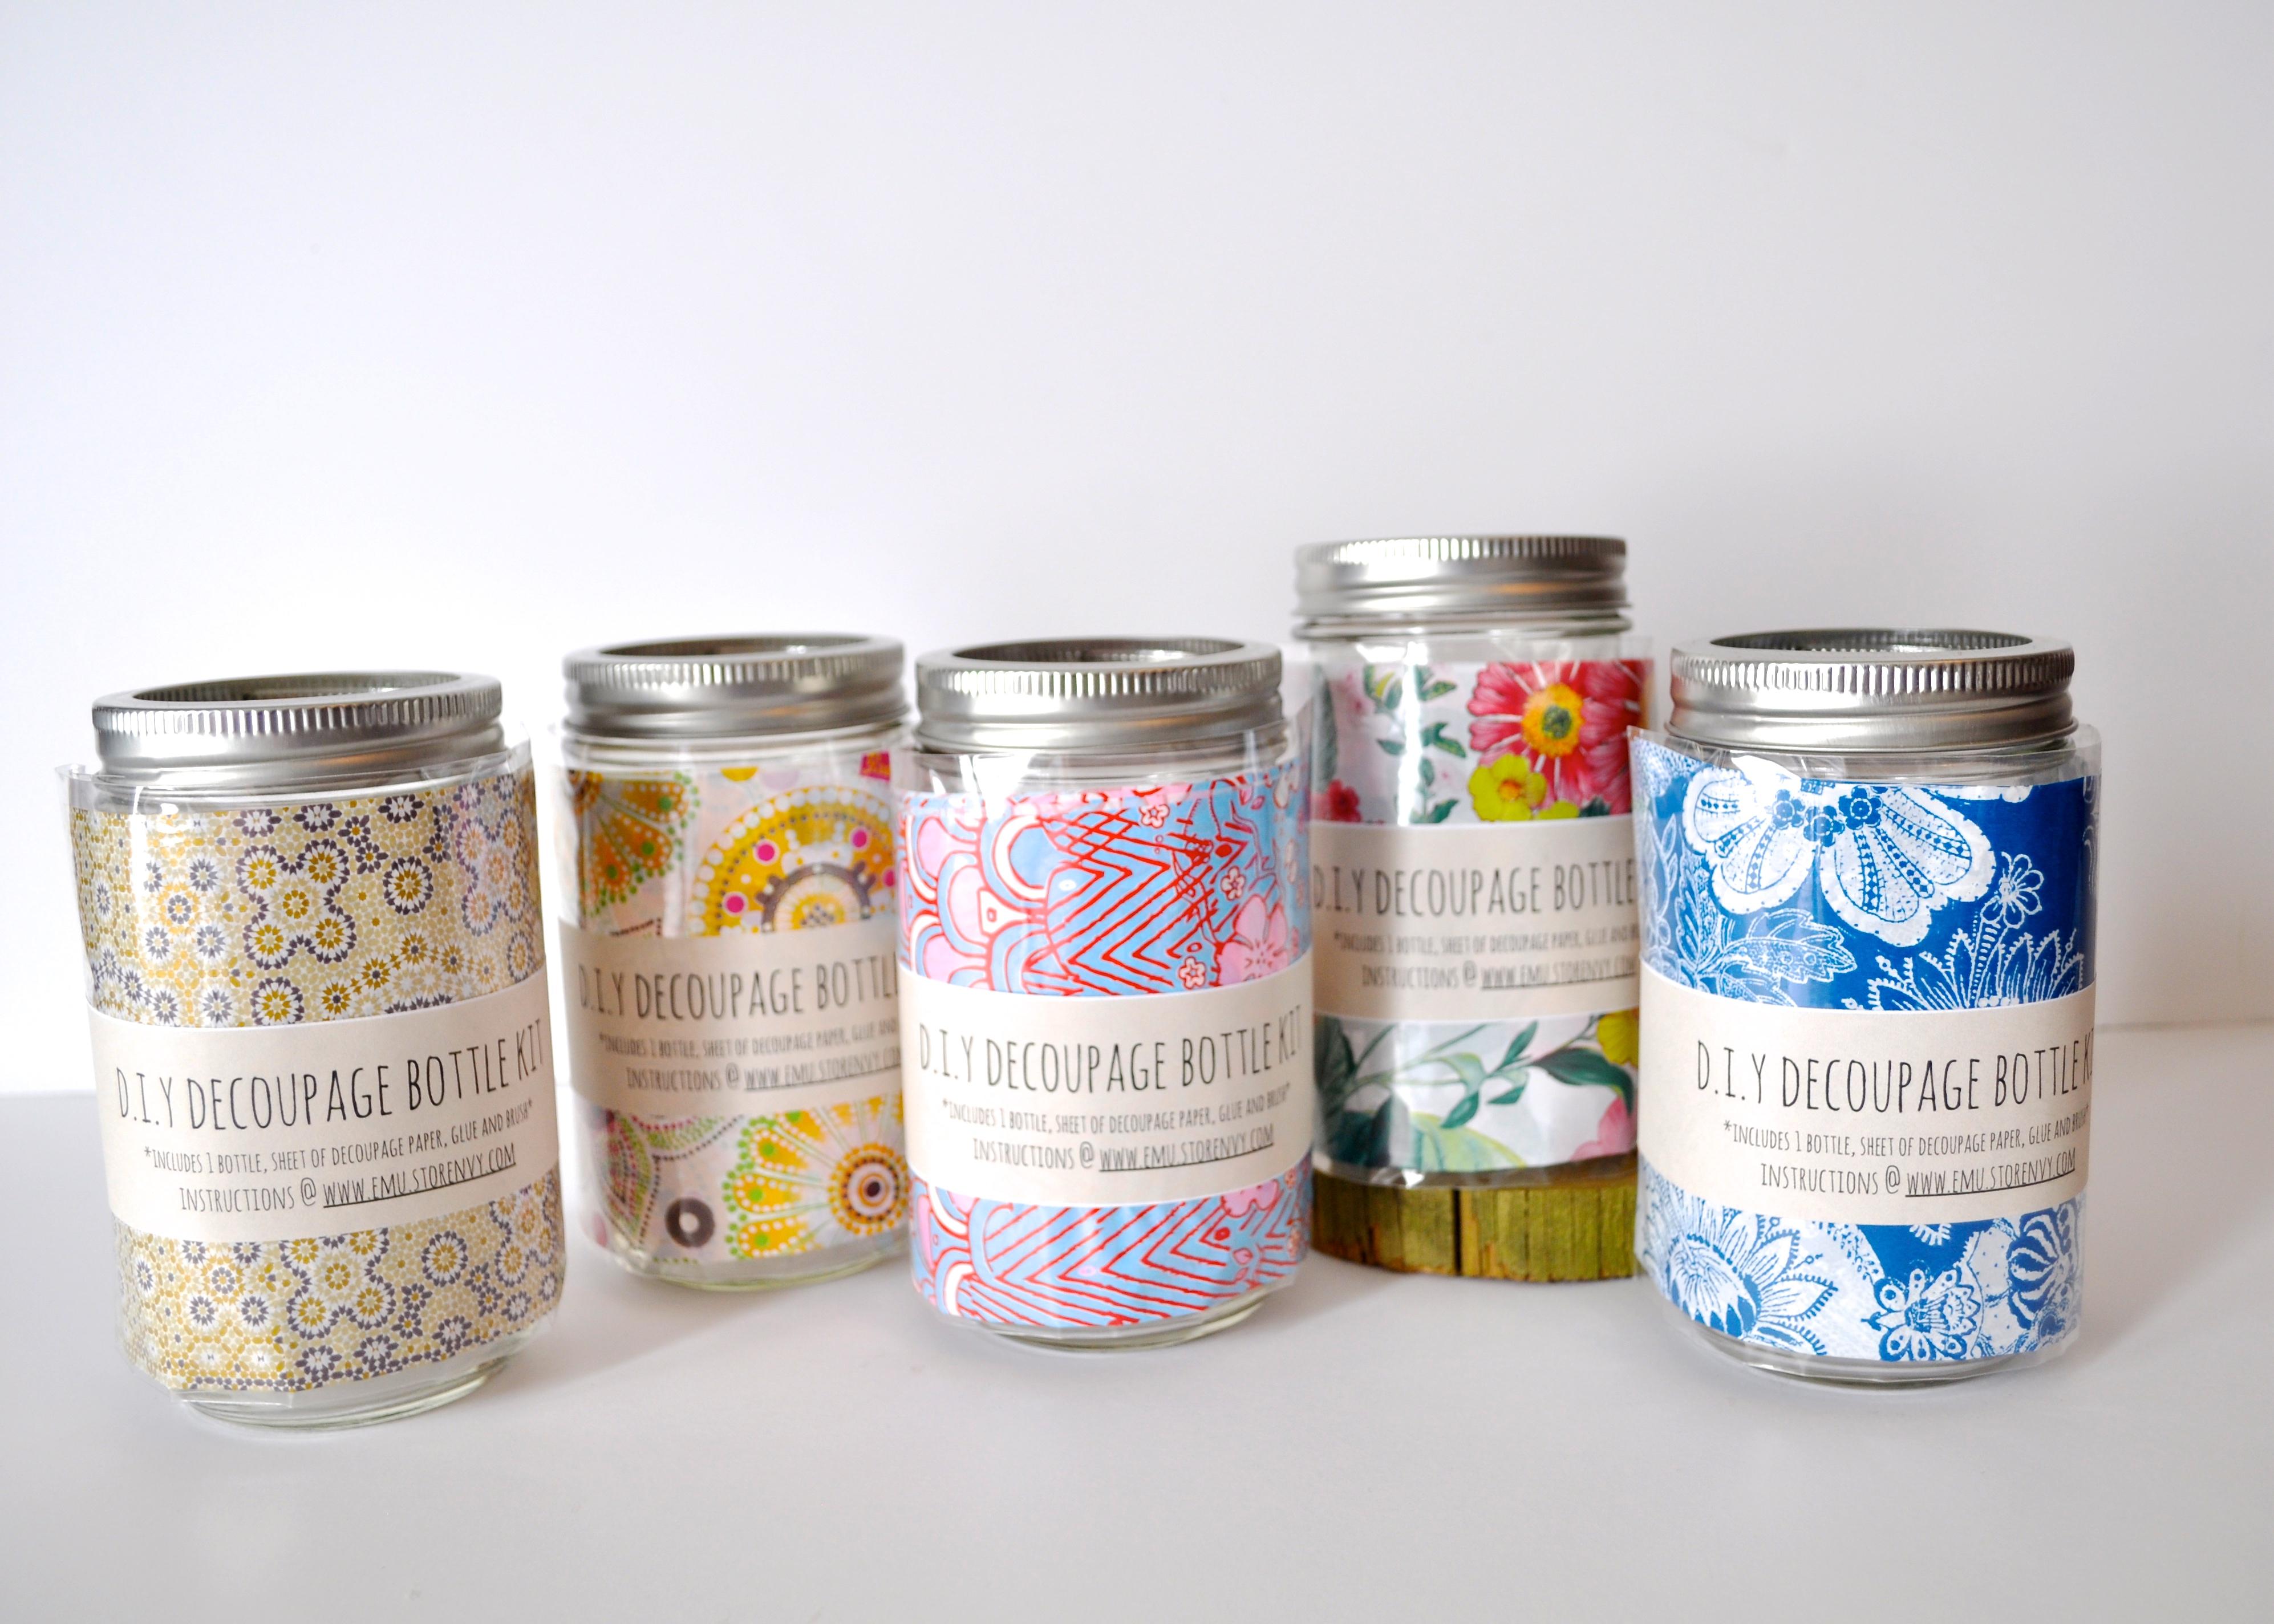 Diy decoupage mason jar kit emu online store powered for Diy bottles and jars